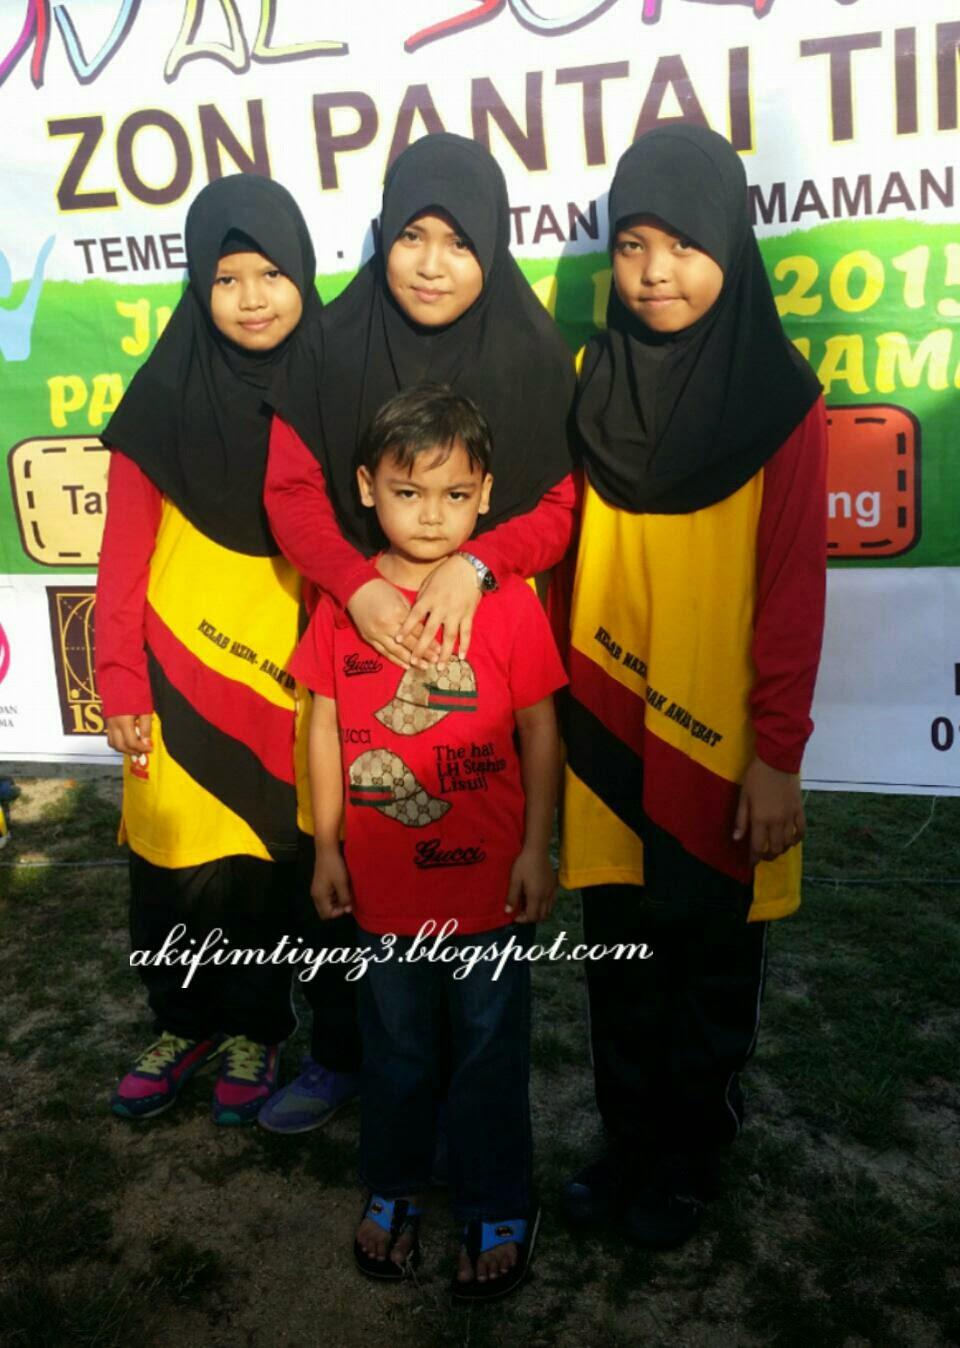 Juara Karnival Sukan Nazim Zon Pantai Timur